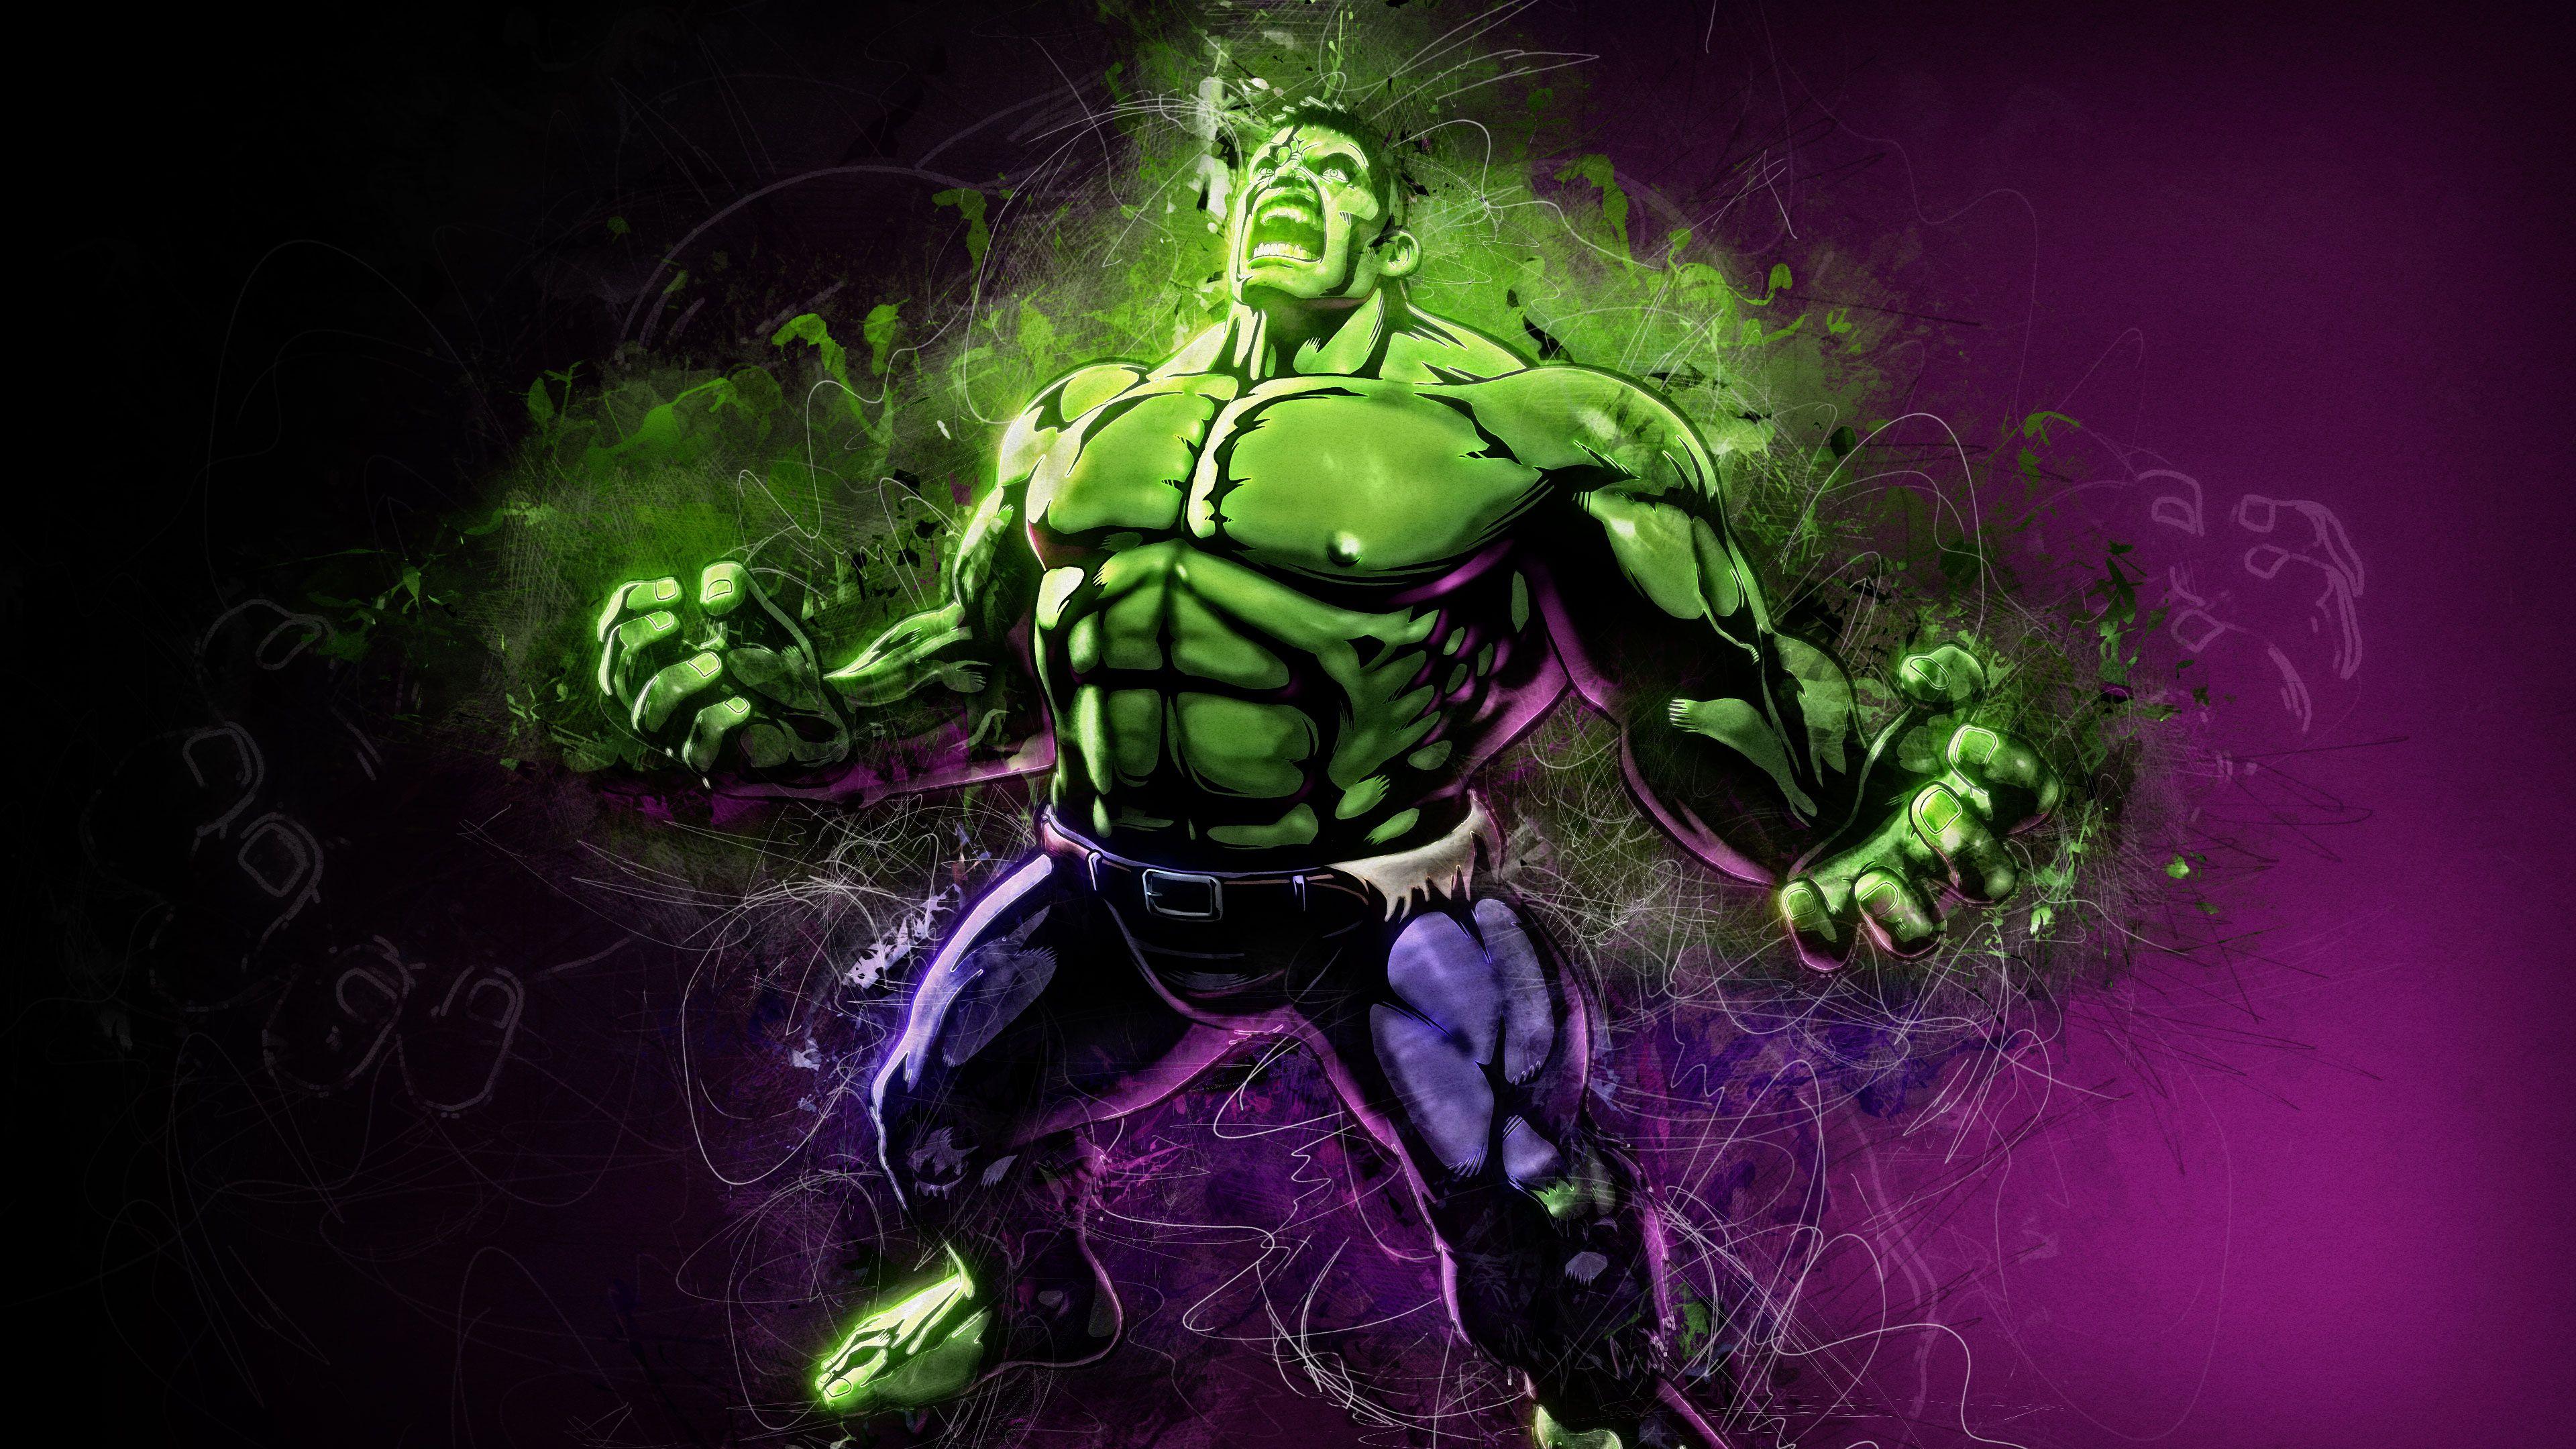 Hulk Artwork 4k Hd Hulk Artwork Marvel Comics Wallpaper Thor Artwork